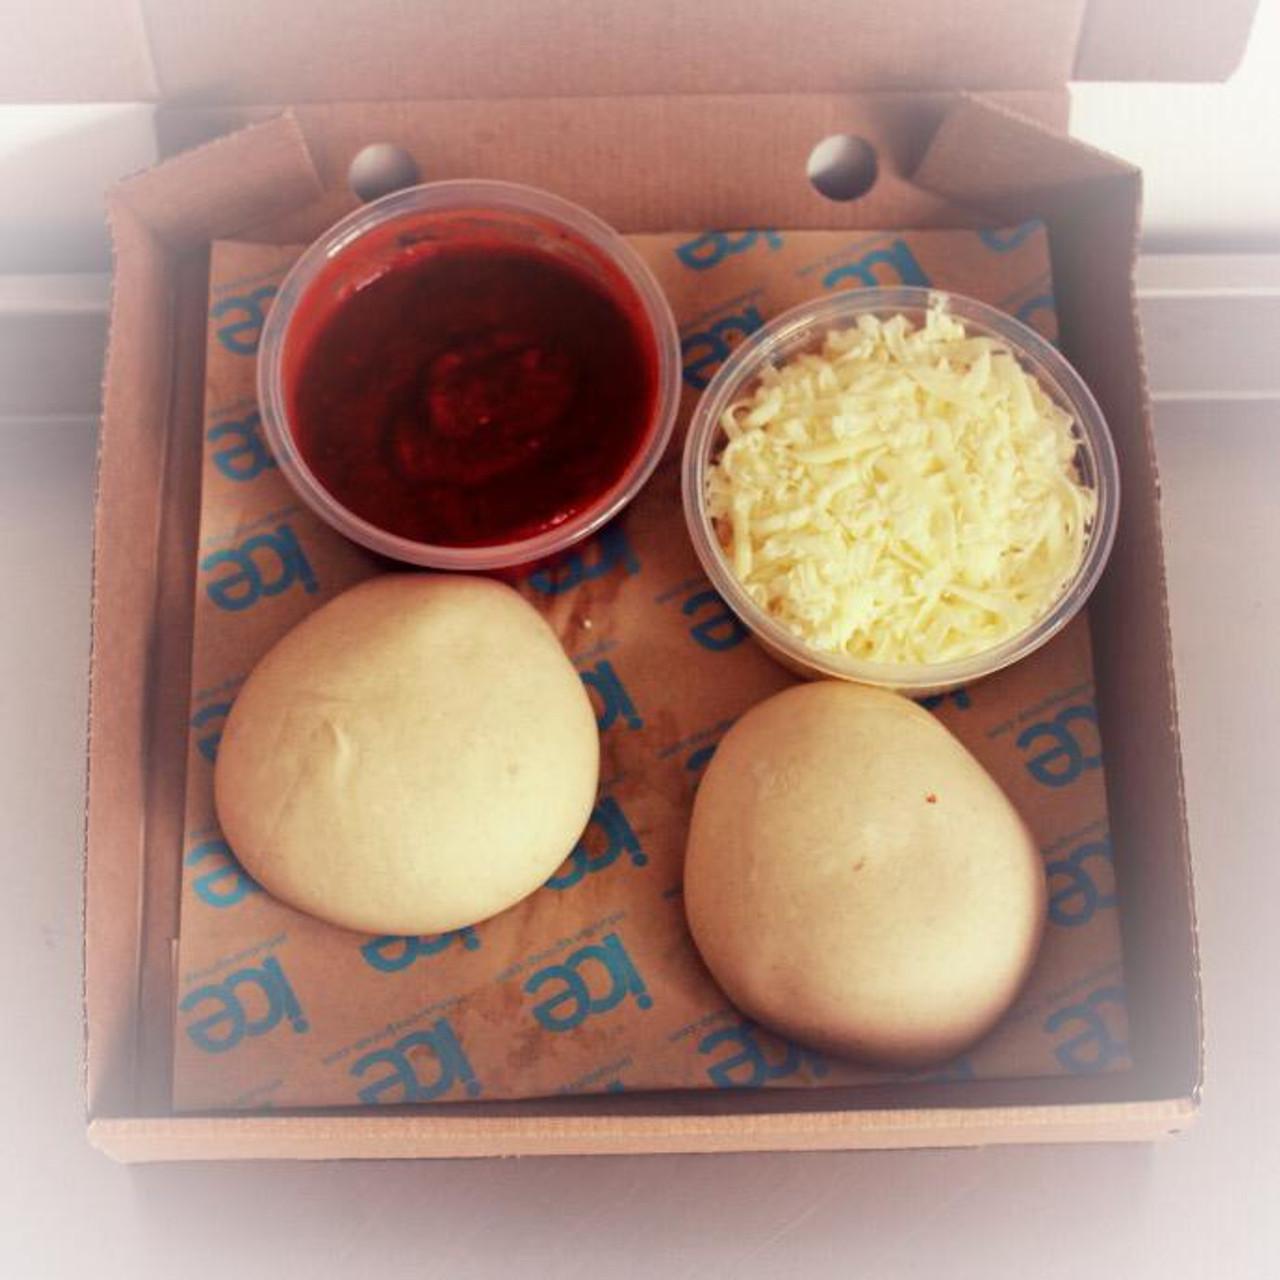 Pizza @ Home - ICE 'n' Simple Kit